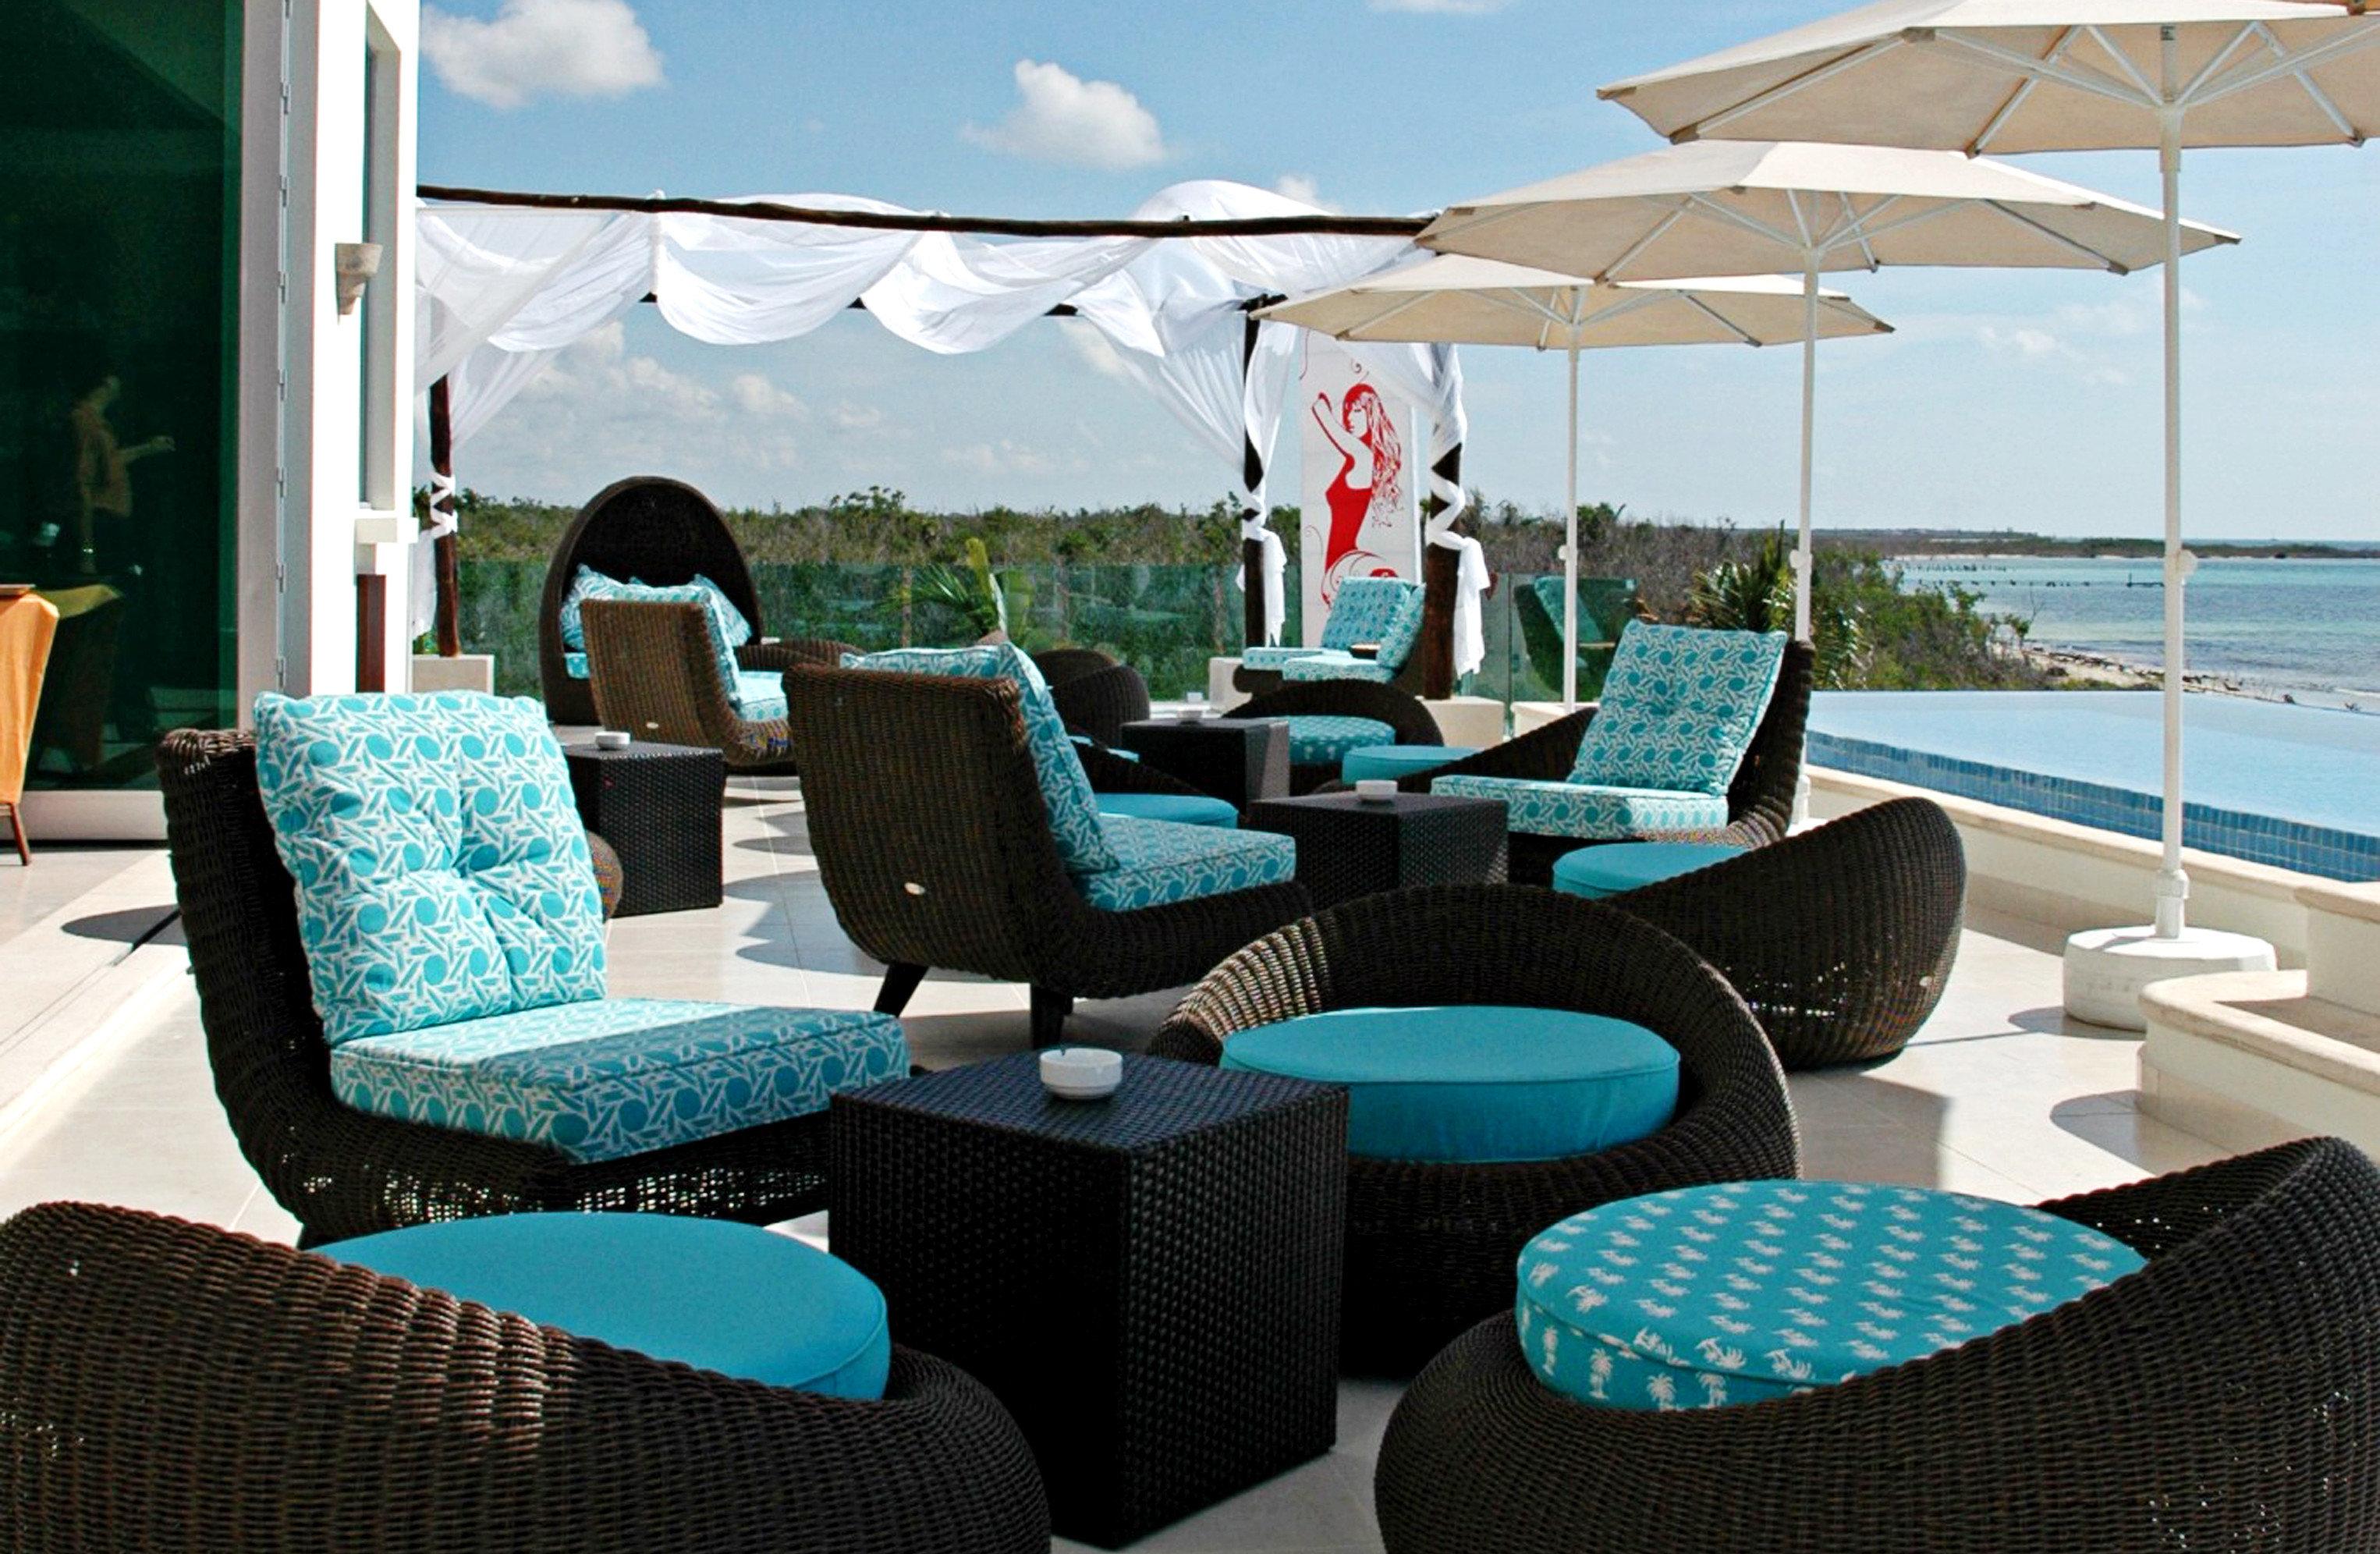 Beachfront Elegant Hip Lounge Luxury sky chair leisure blue living room day